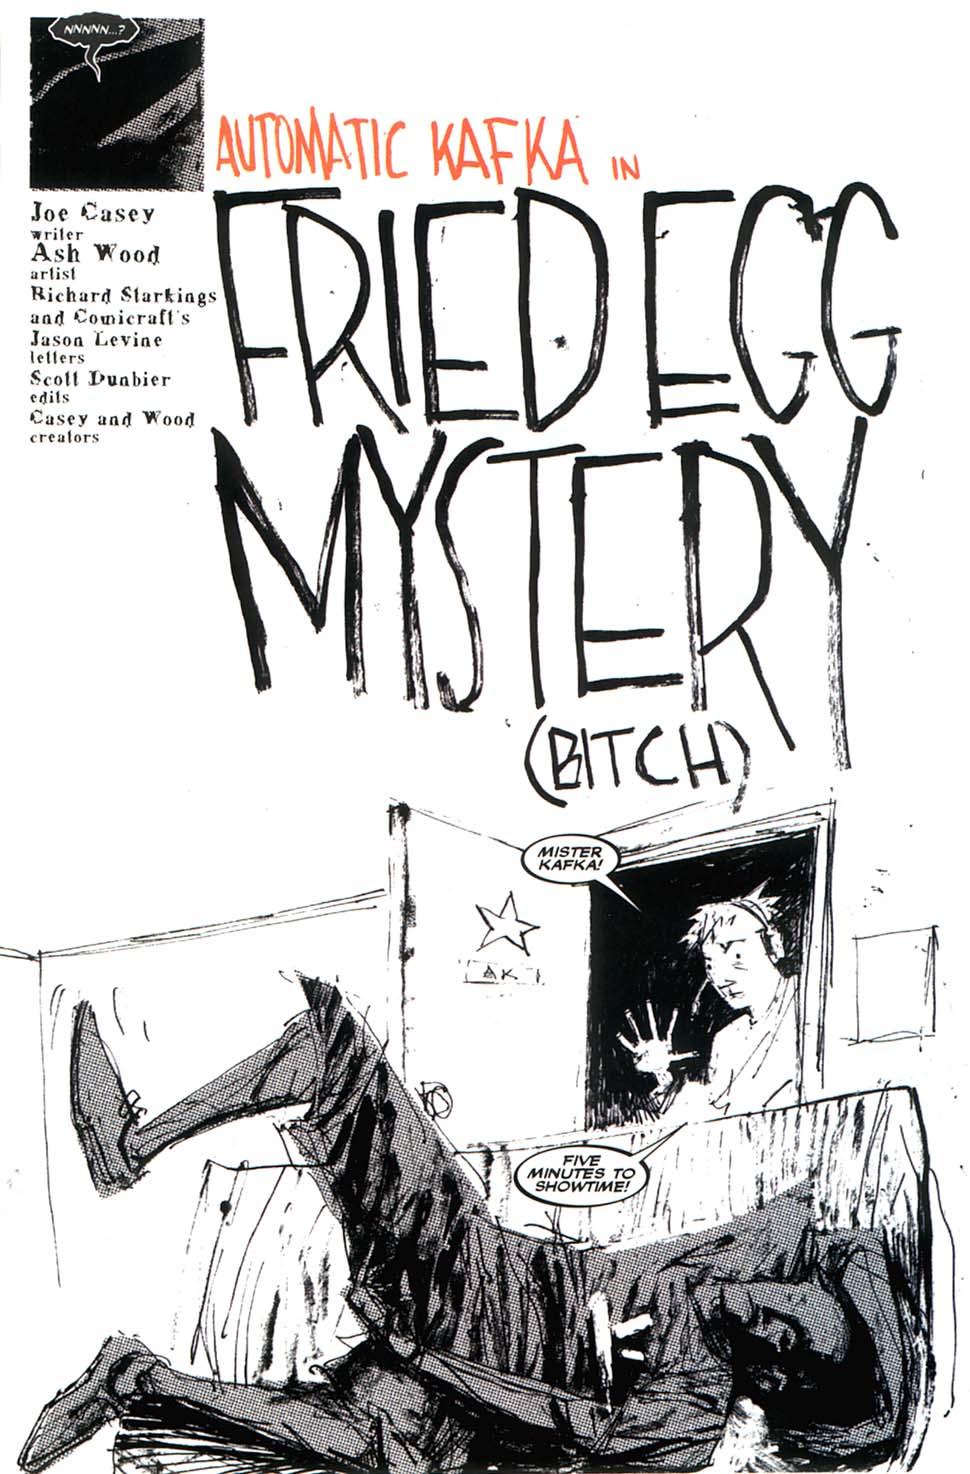 Read online Automatic Kafka comic -  Issue #8 - 7